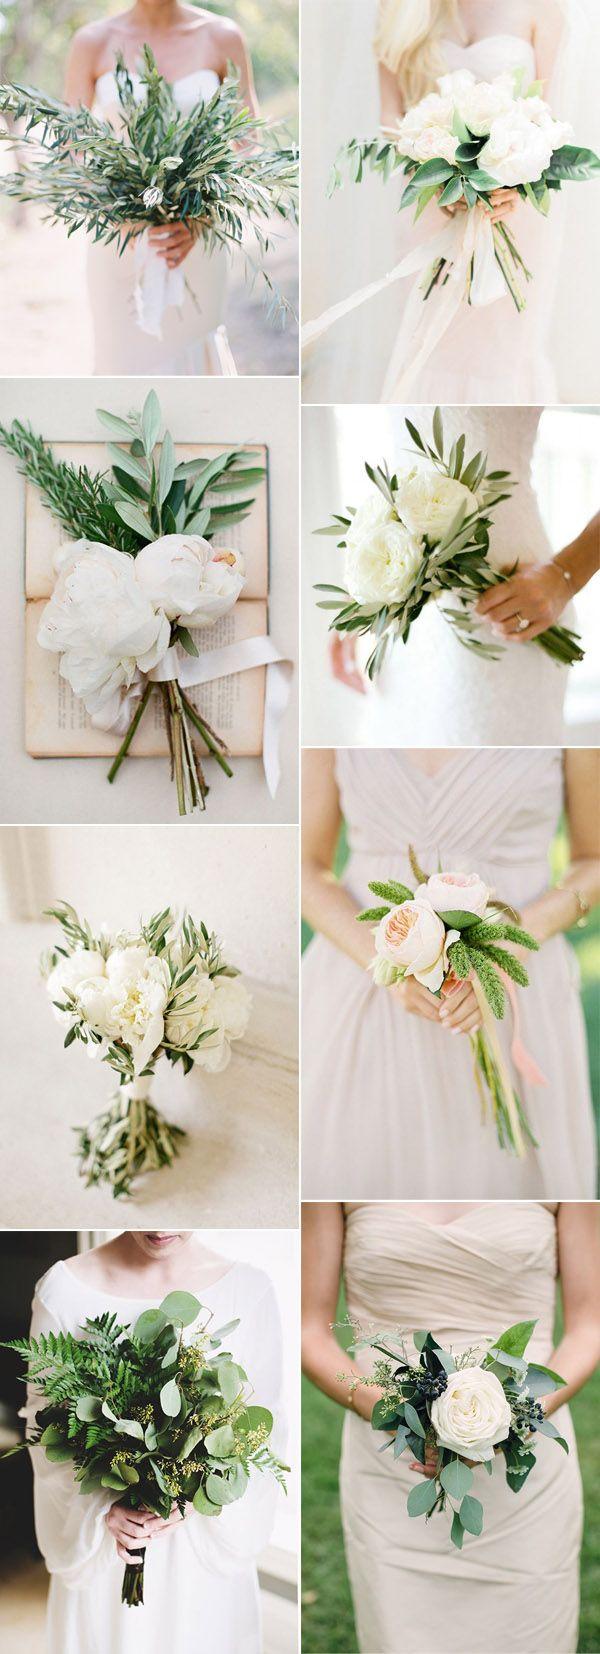 2017 TrendsEasy Diy Organic Minimalist Wedding Ideas